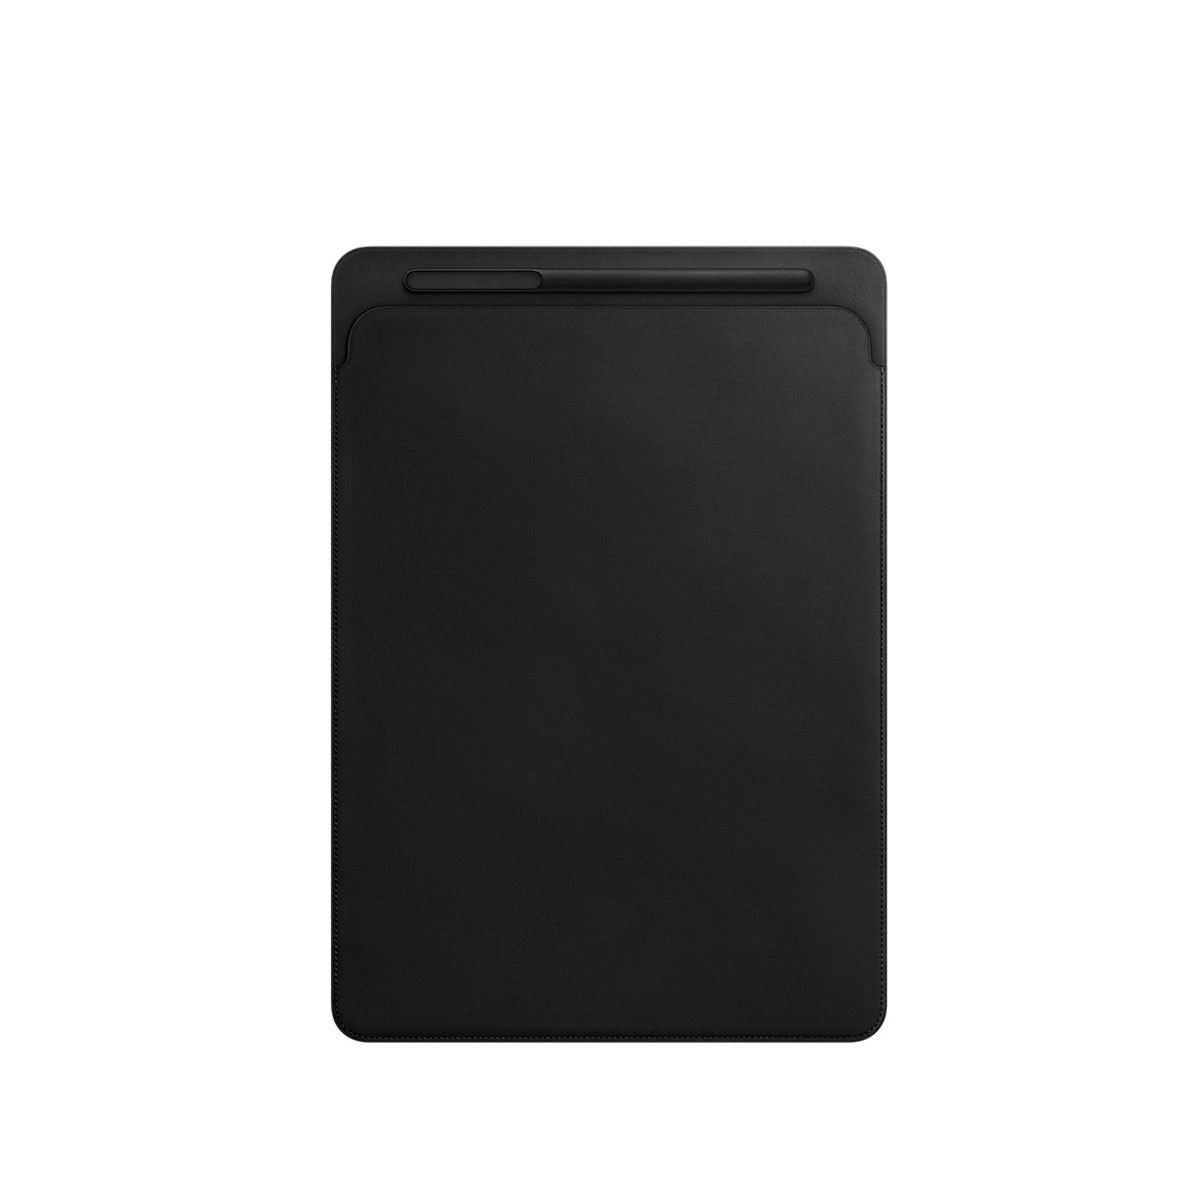 Kožený návlek na 12,9palcový iPad Pro - černý